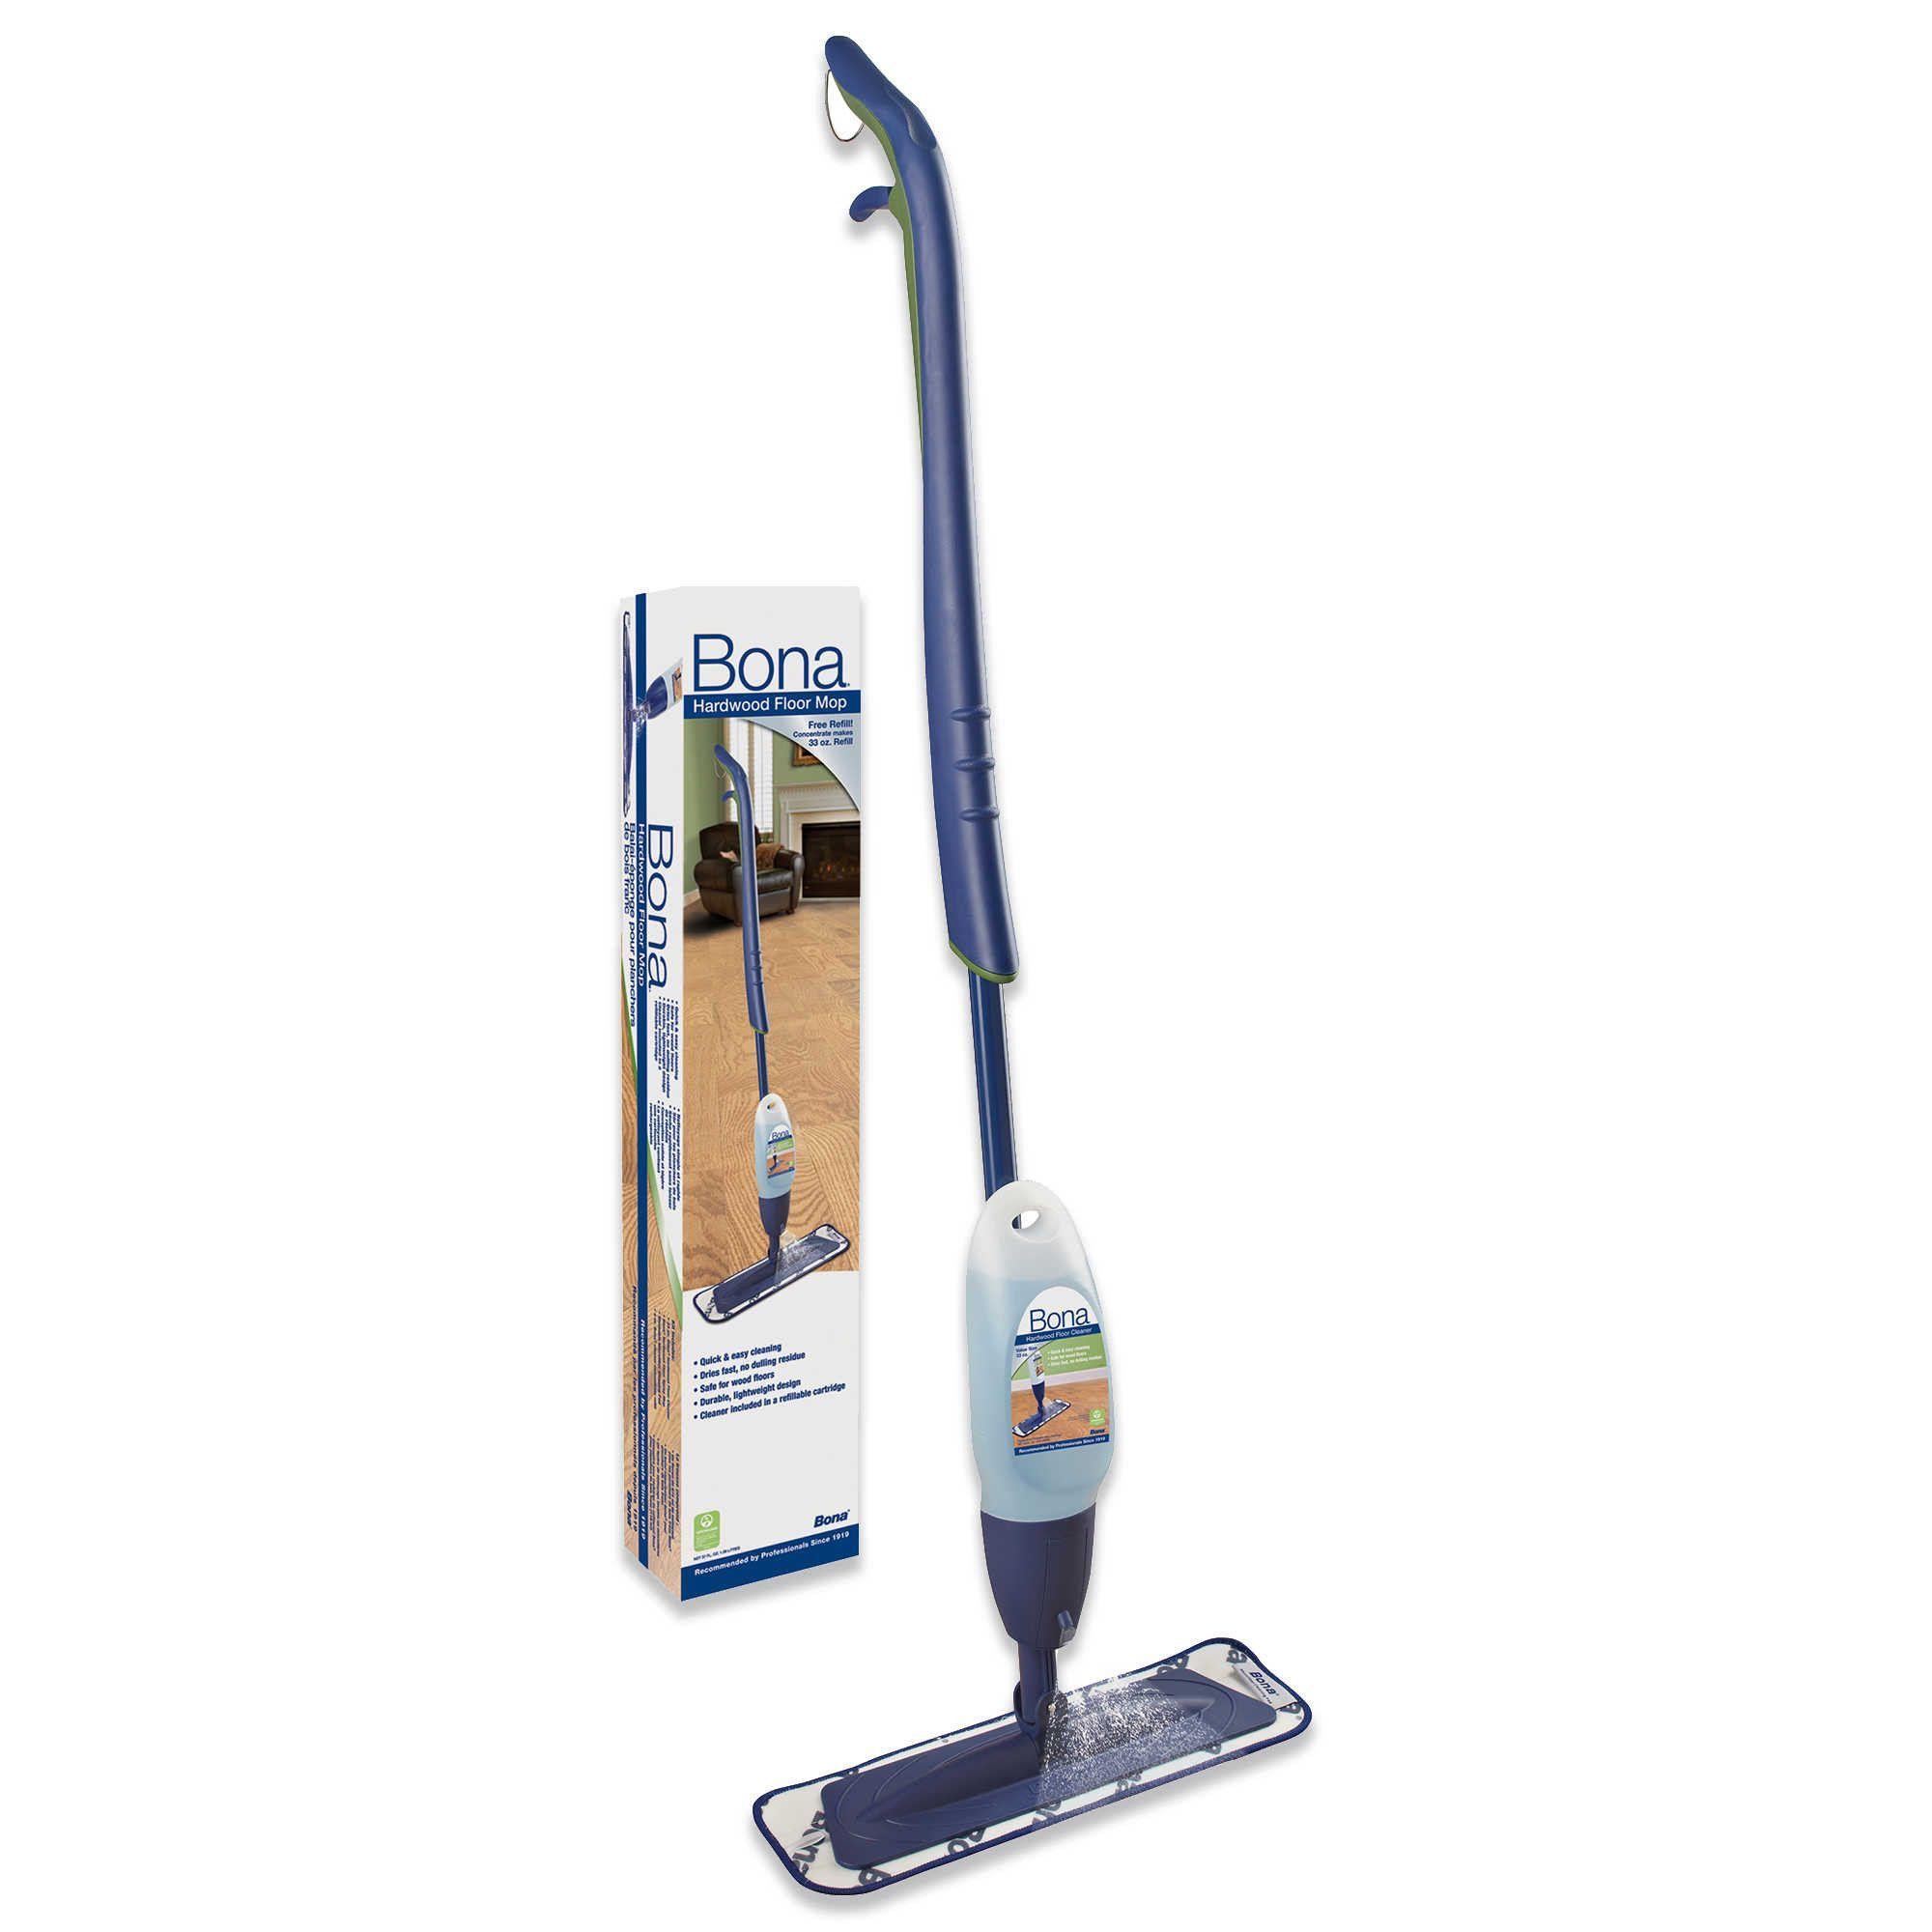 Bona® Hardwood Floor Mop Kit Laminate flooring, Floor